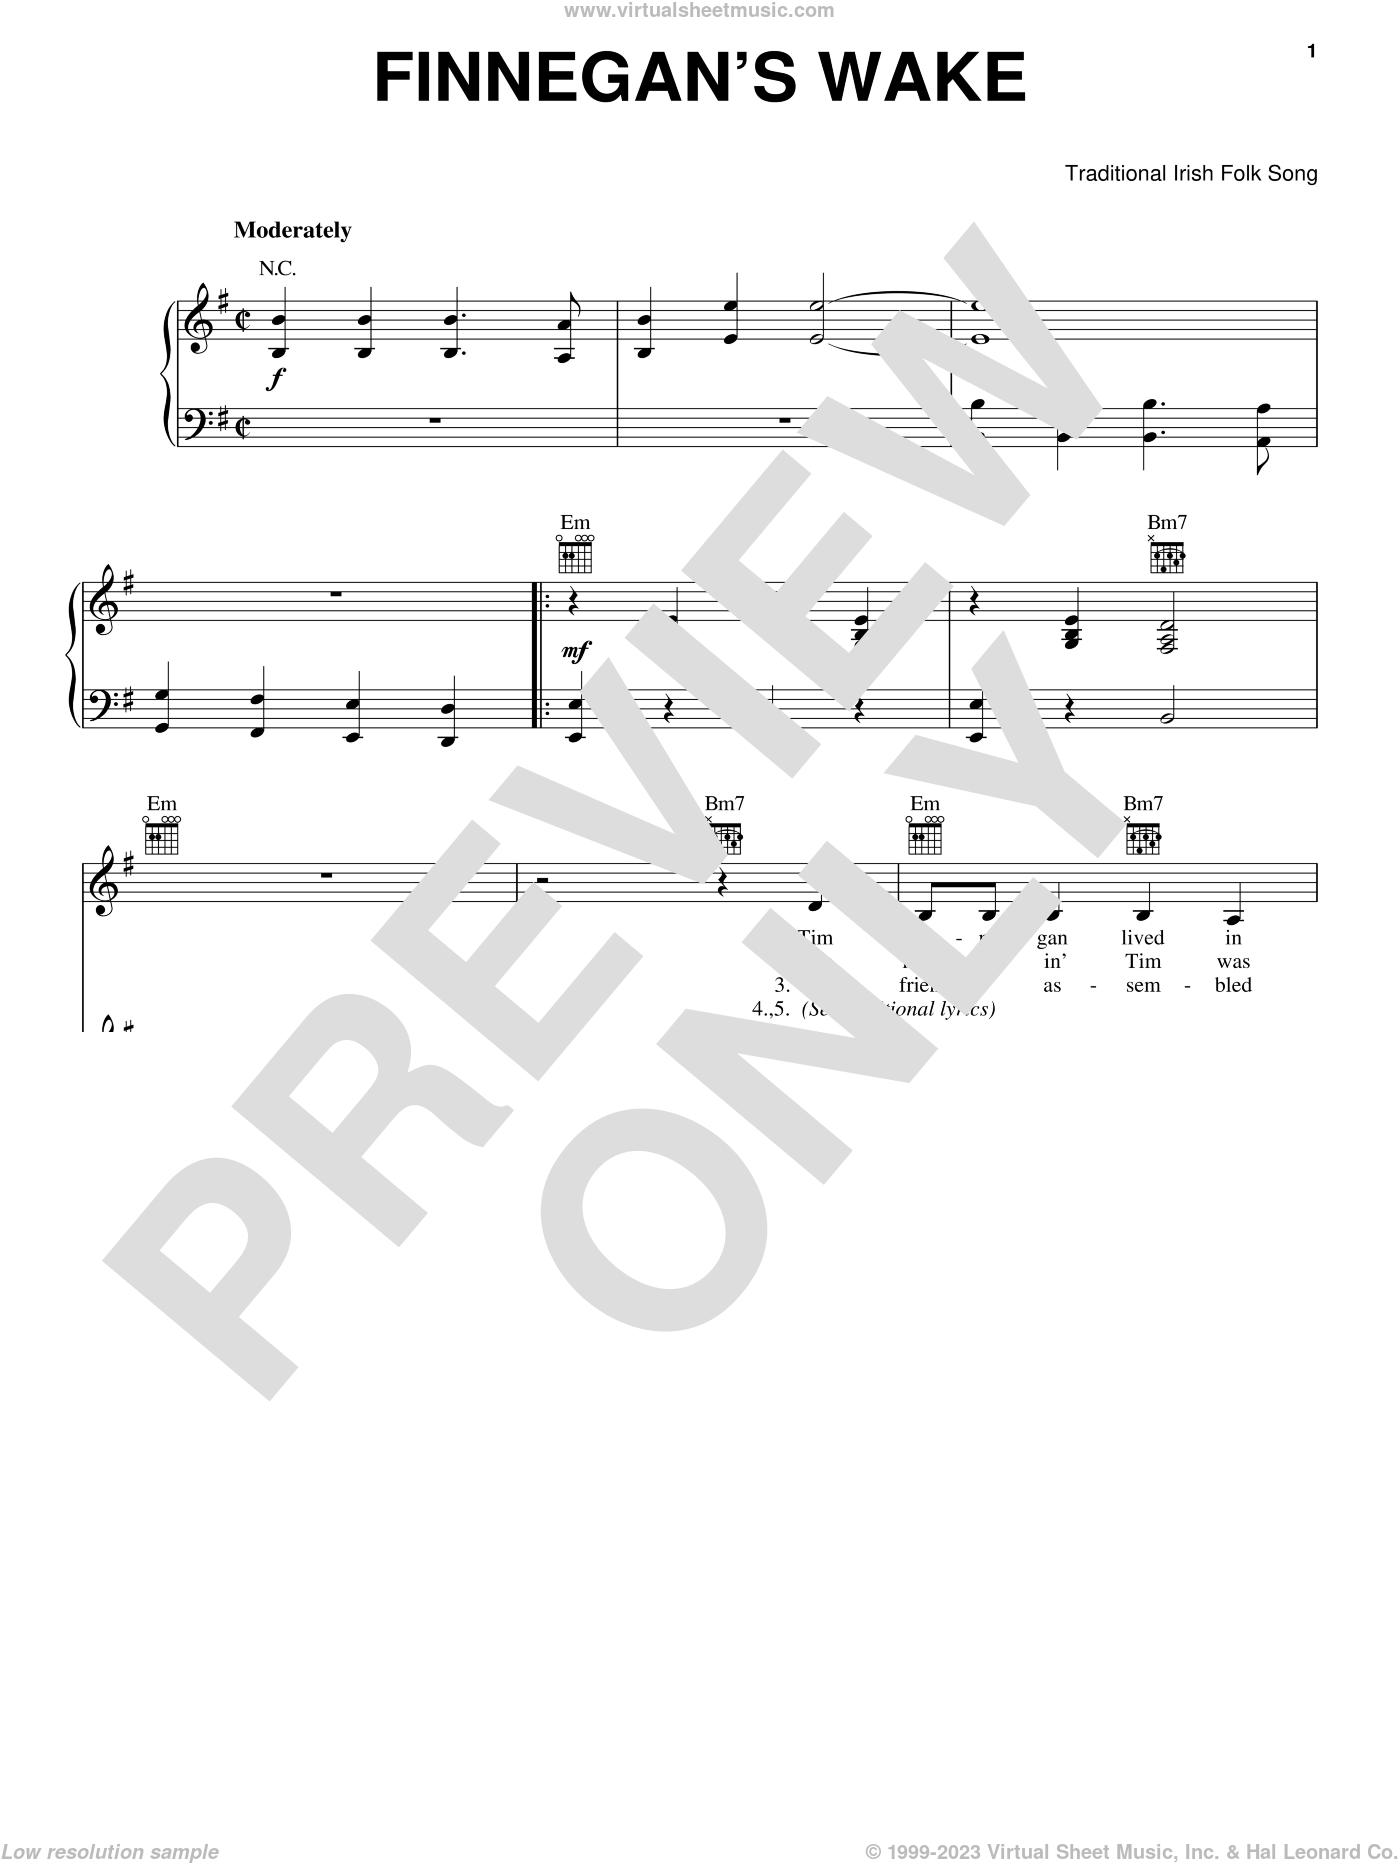 Finnegan's Wake sheet music for voice, piano or guitar, intermediate skill level